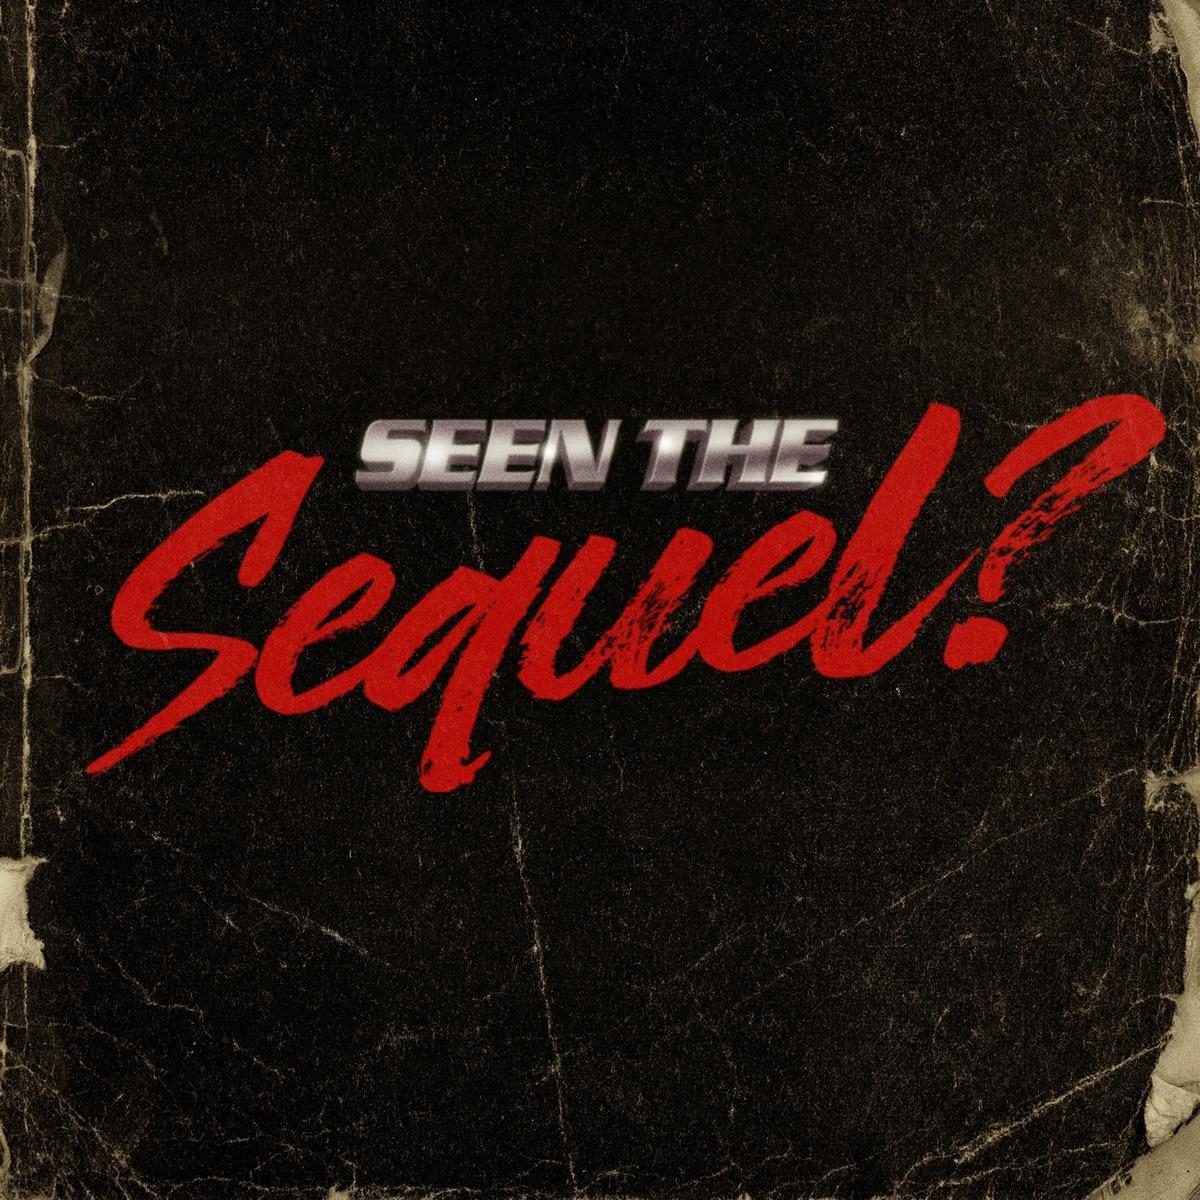 Seen the Sequel?